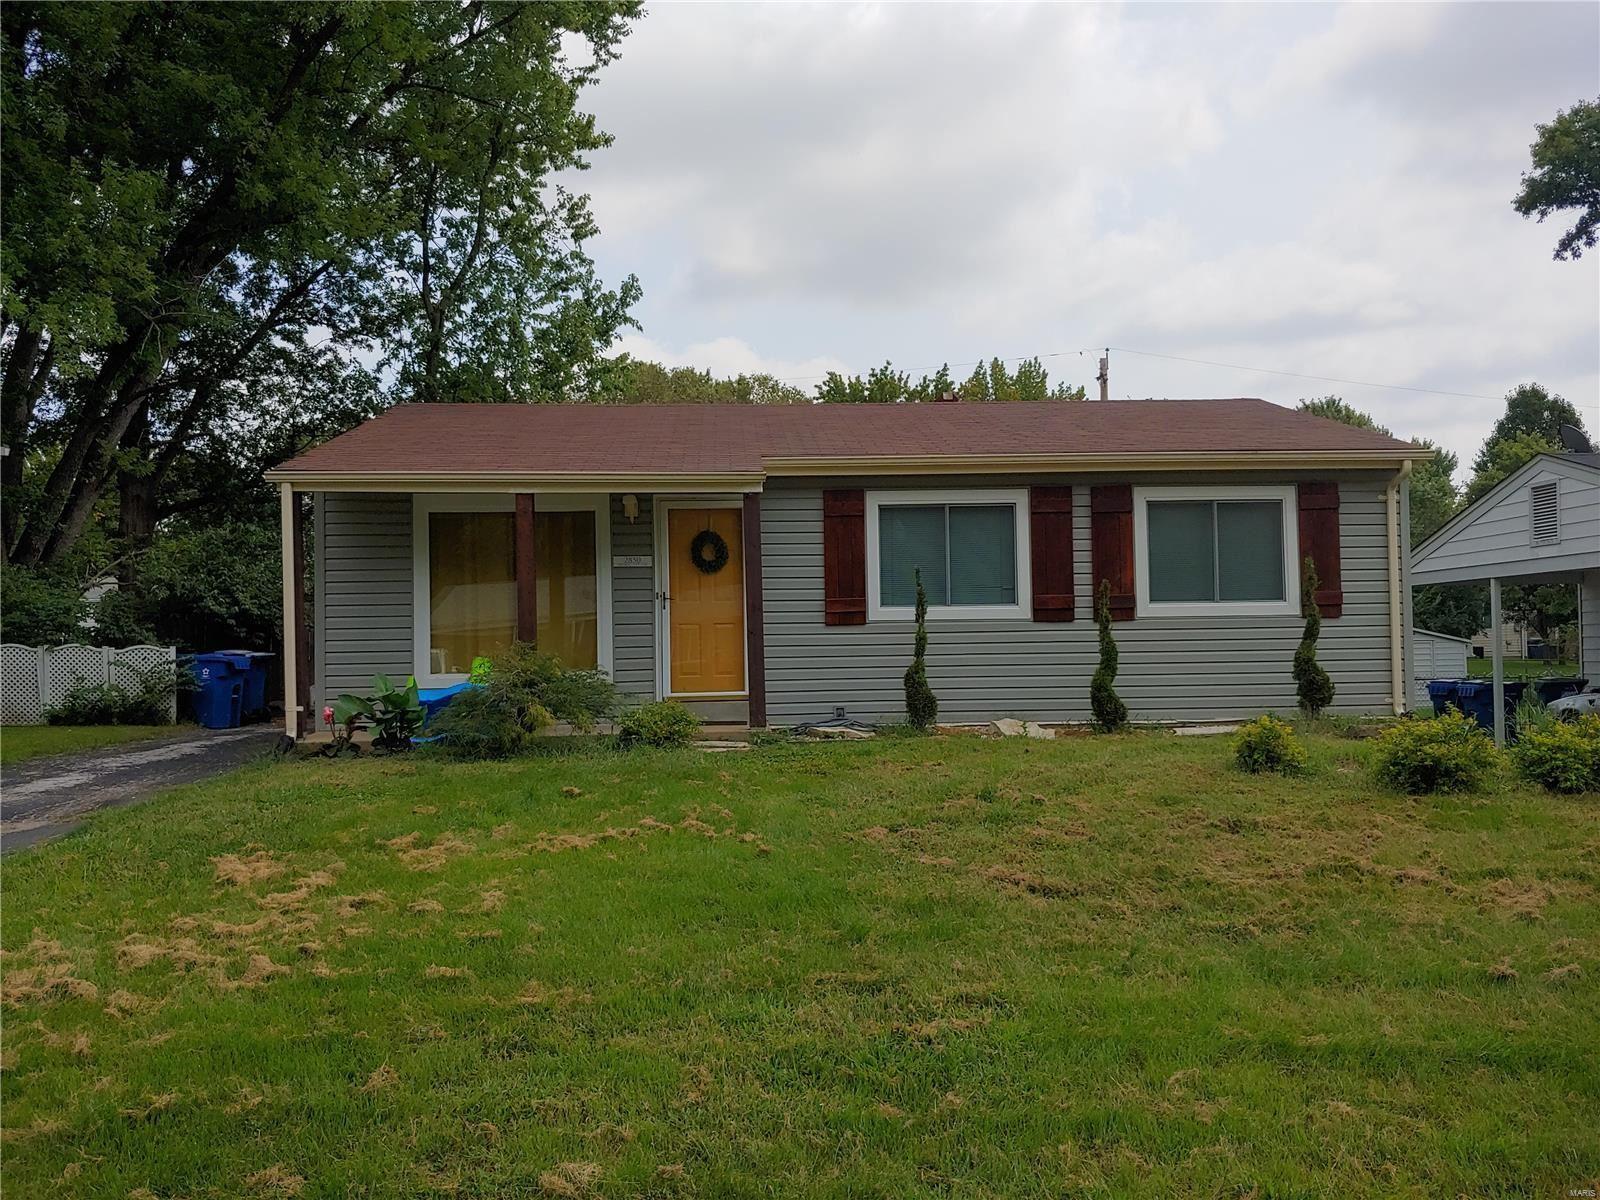 2850 Briarcote Drive, Maryland Heights, MO 63043 - MLS#: 19068951